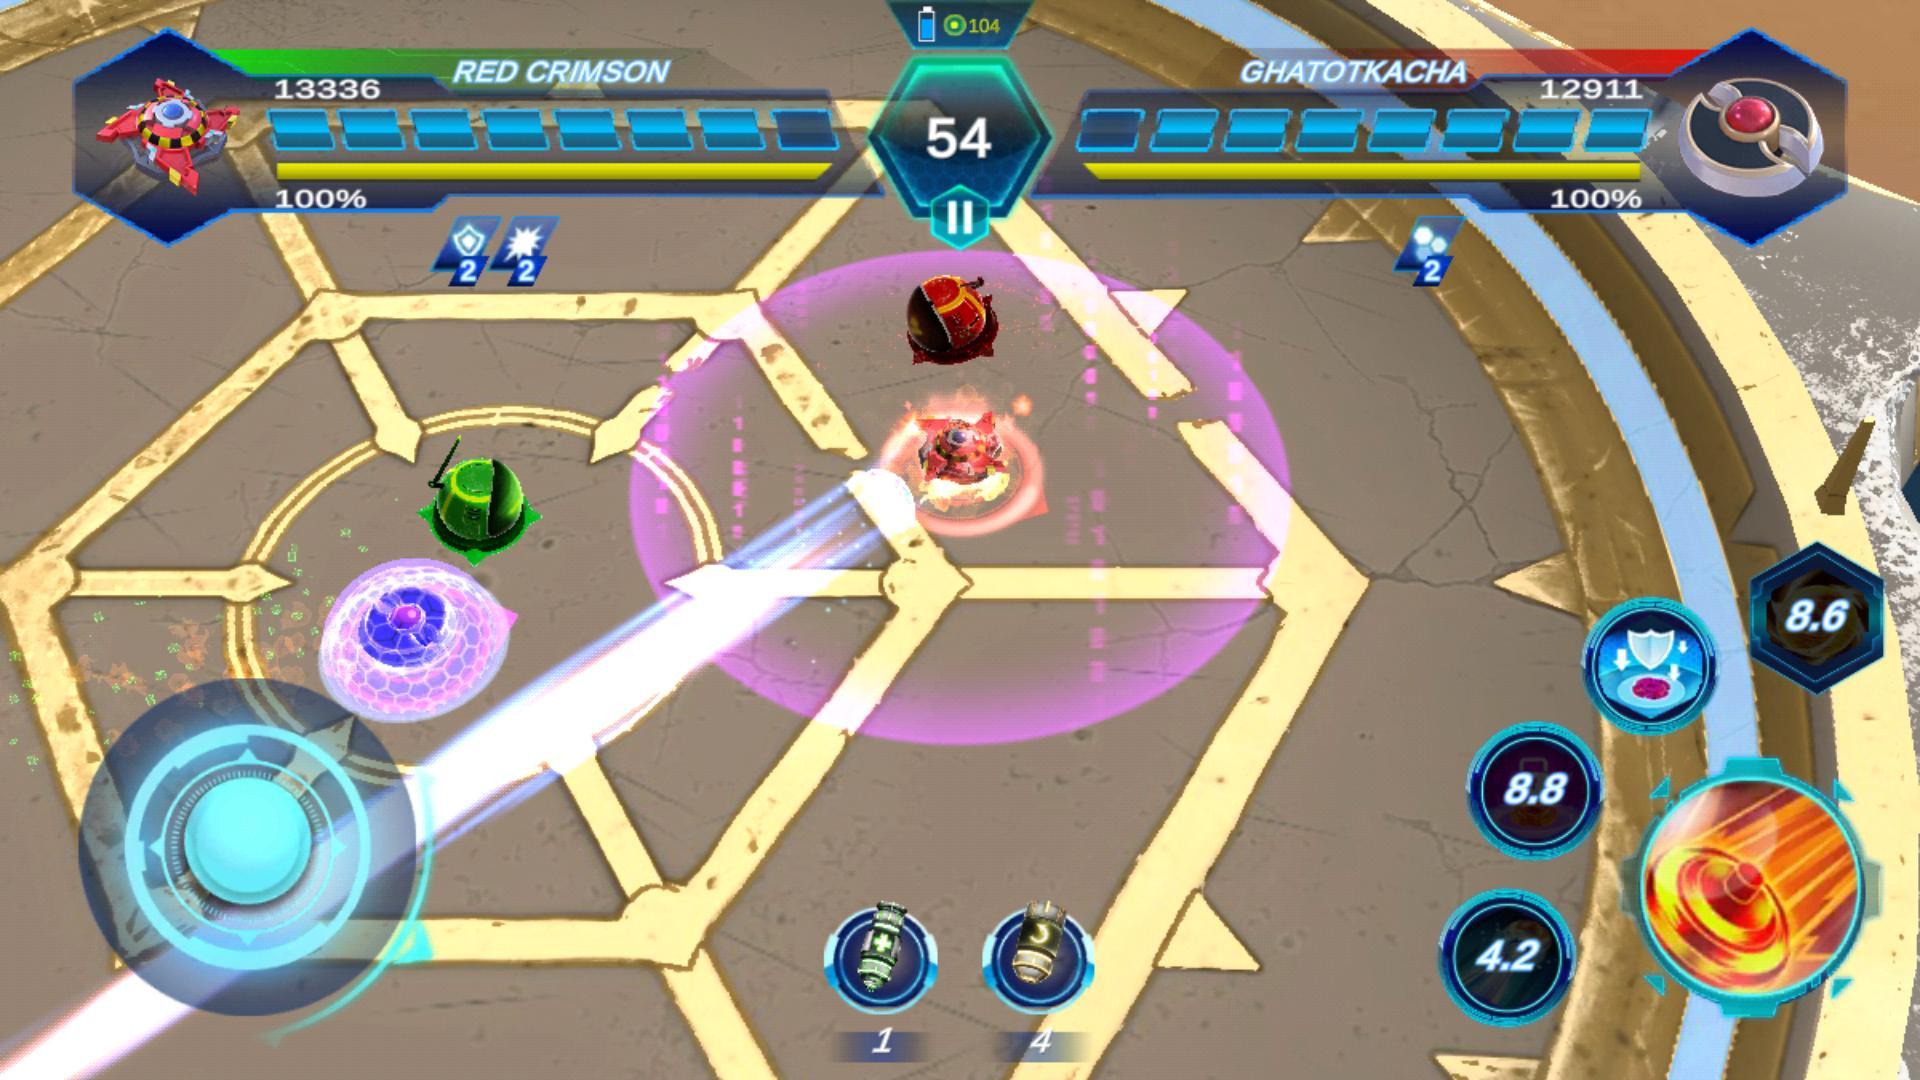 Gyro based games